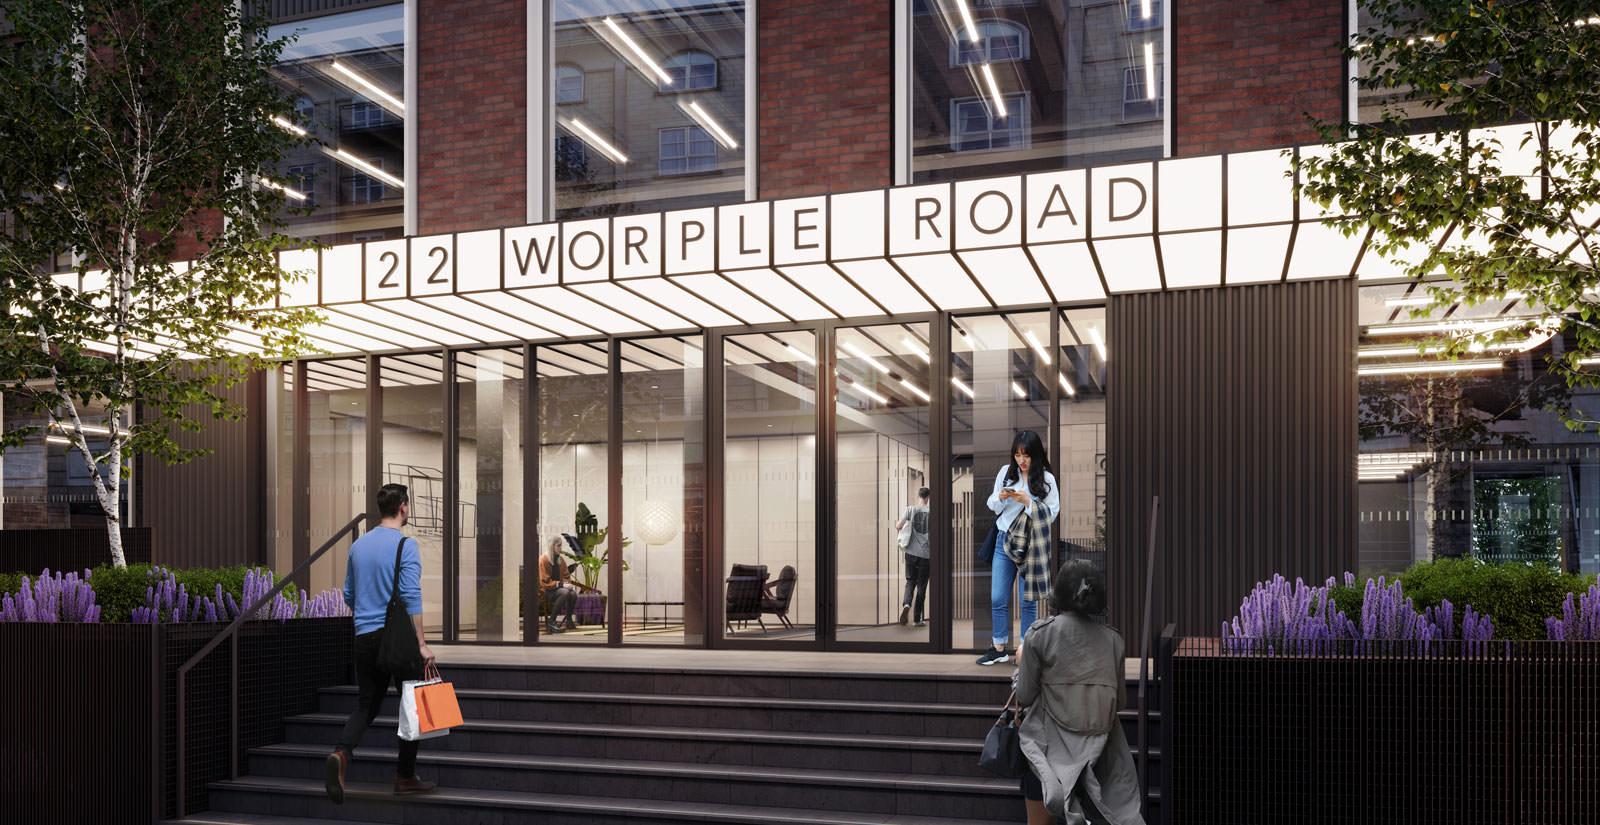 22 Worple Road Wimbledon